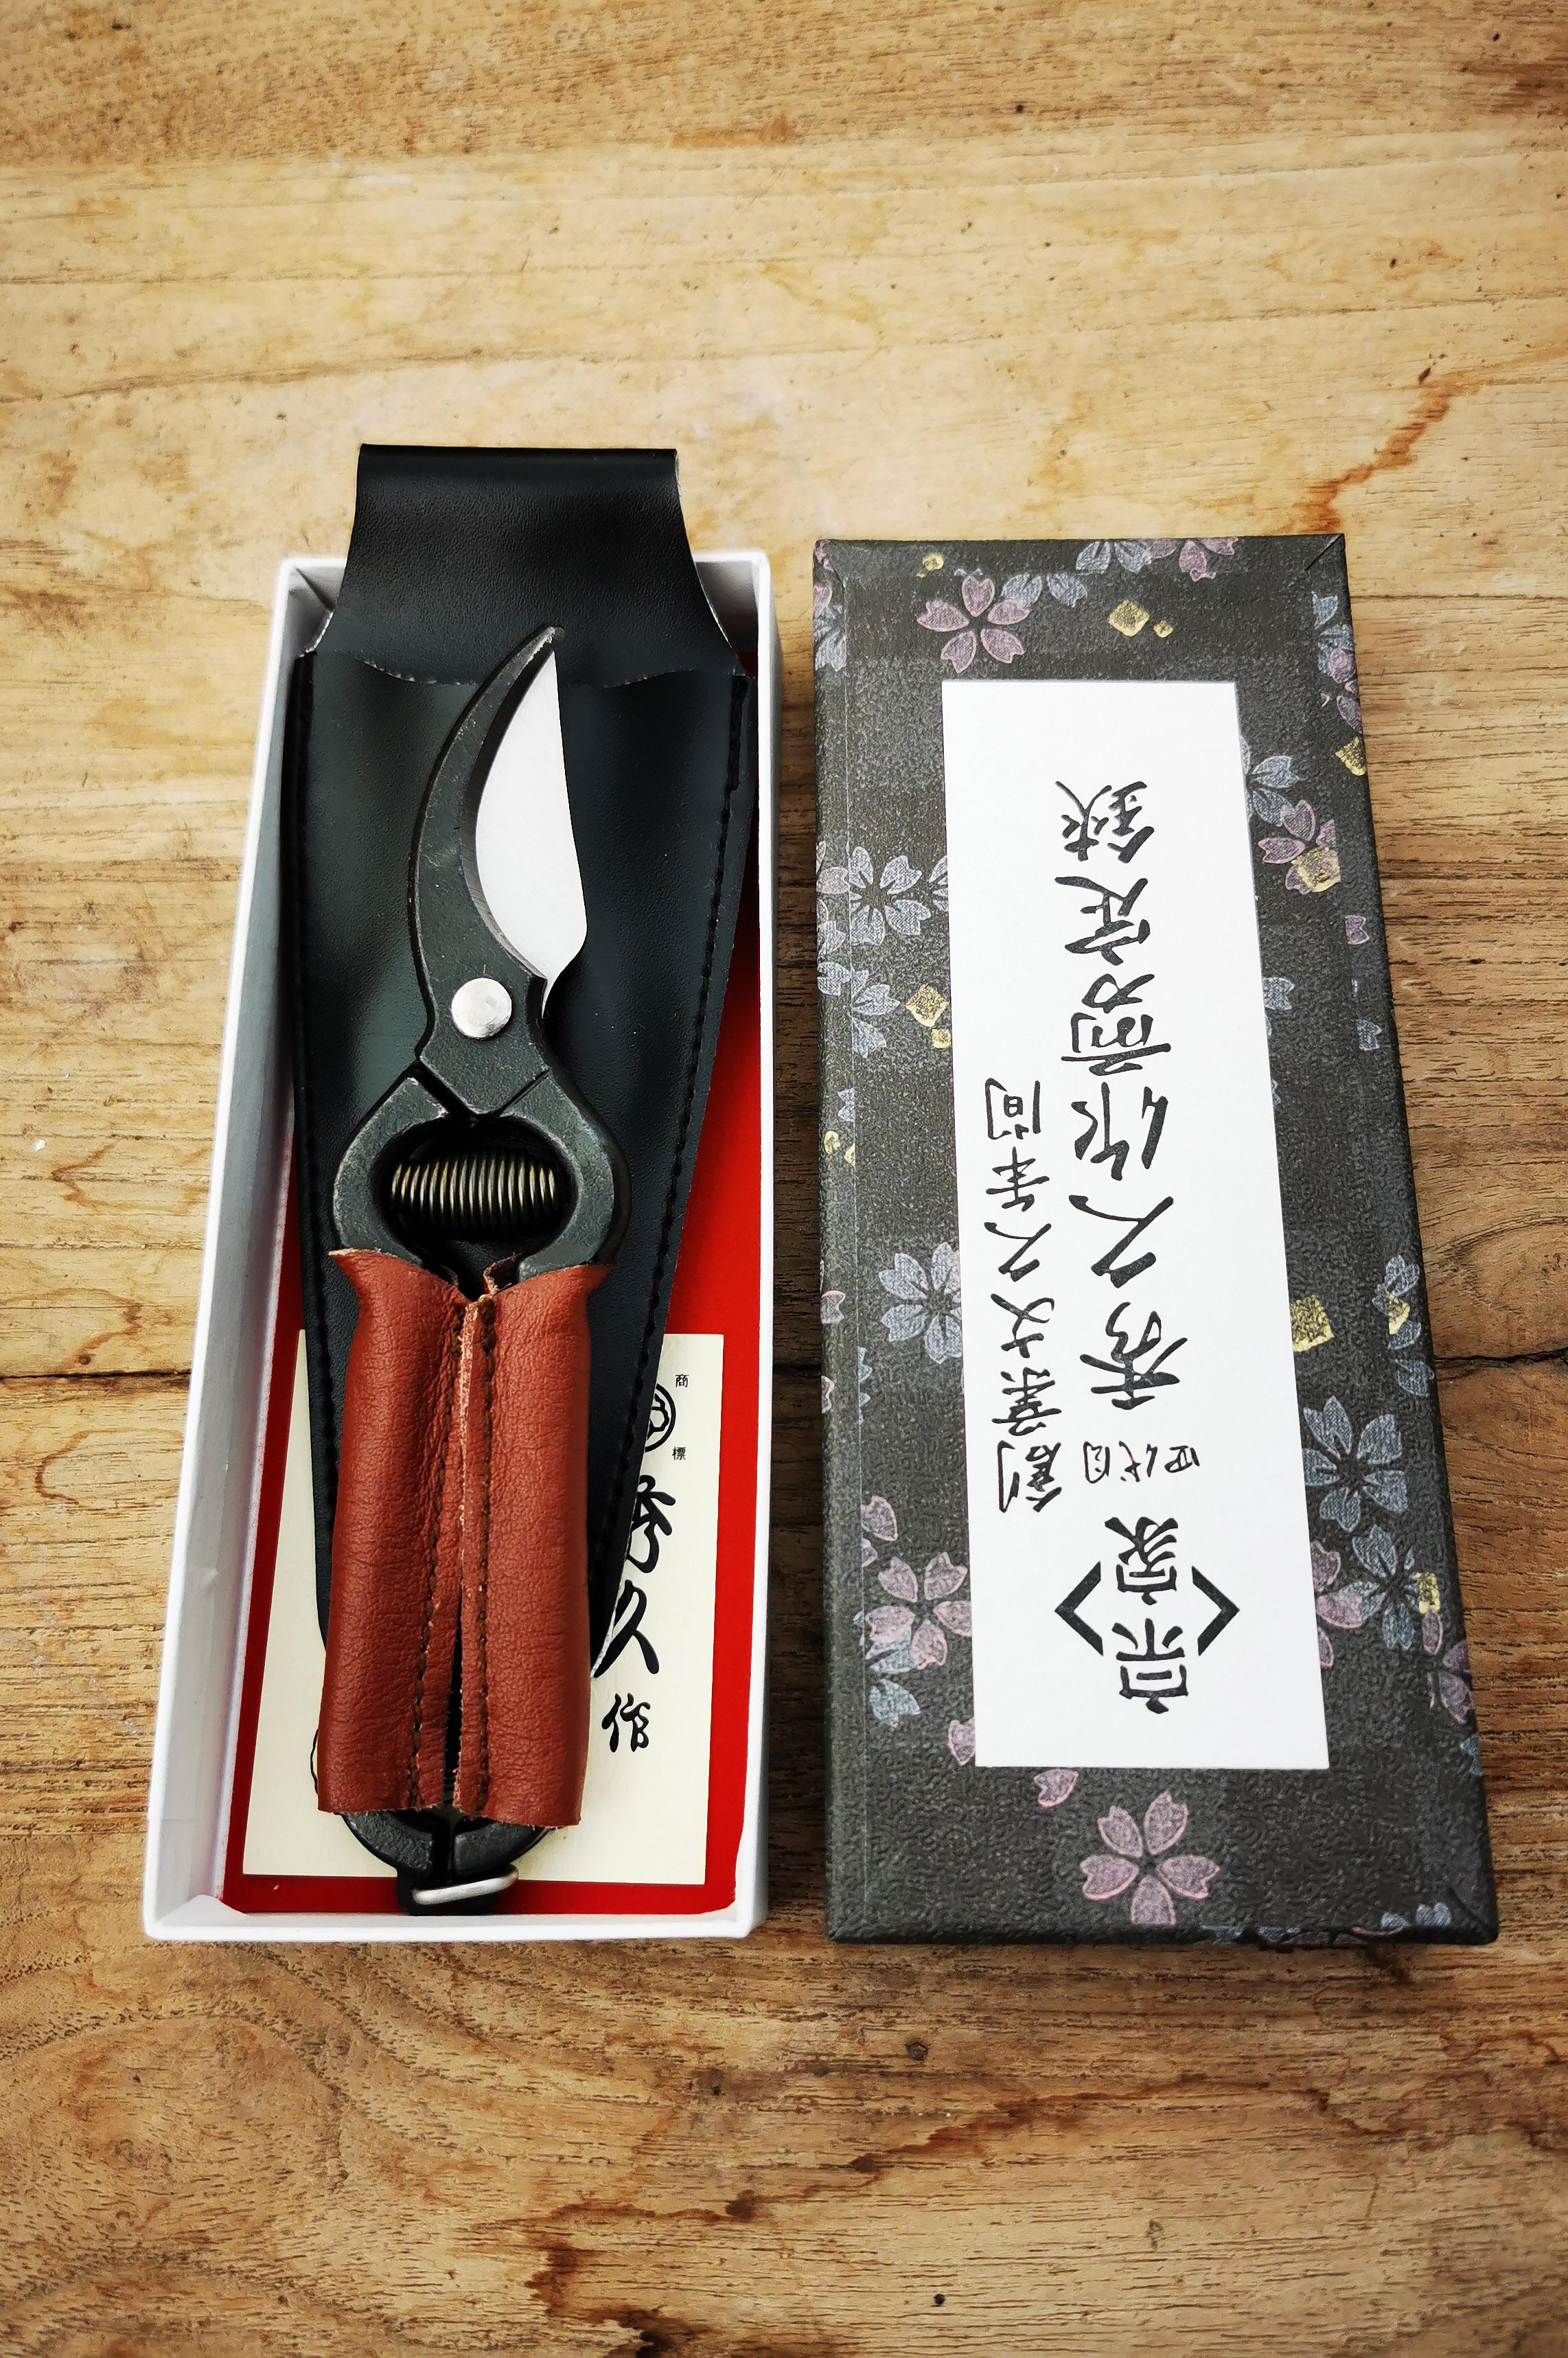 Niwaki Mini Secateur Leather